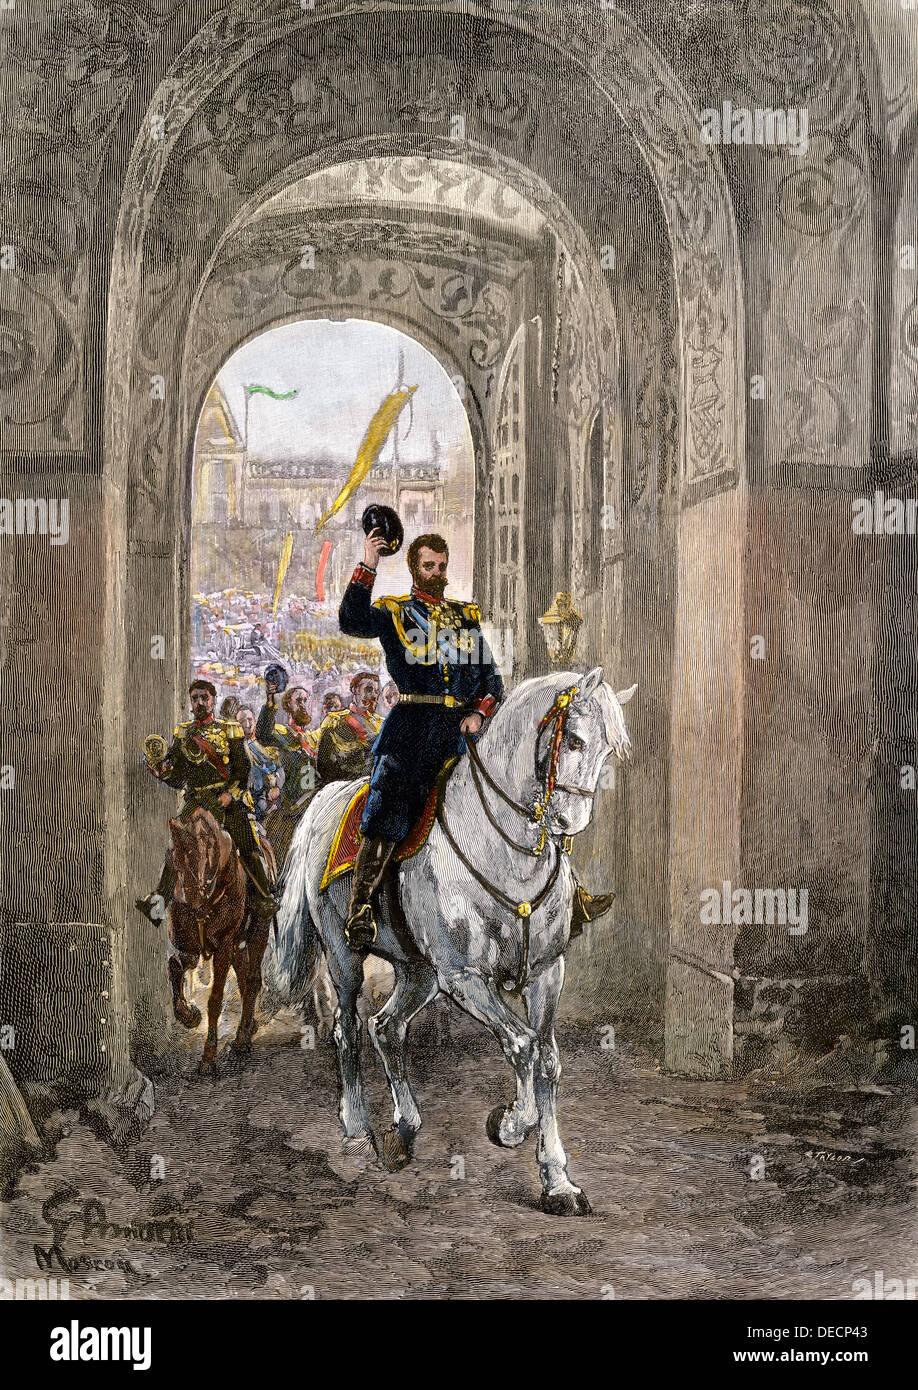 Czar Nicholas II entering the Kremlin gate for his coronation, 1896. Hand-colored woodcut - Stock Image